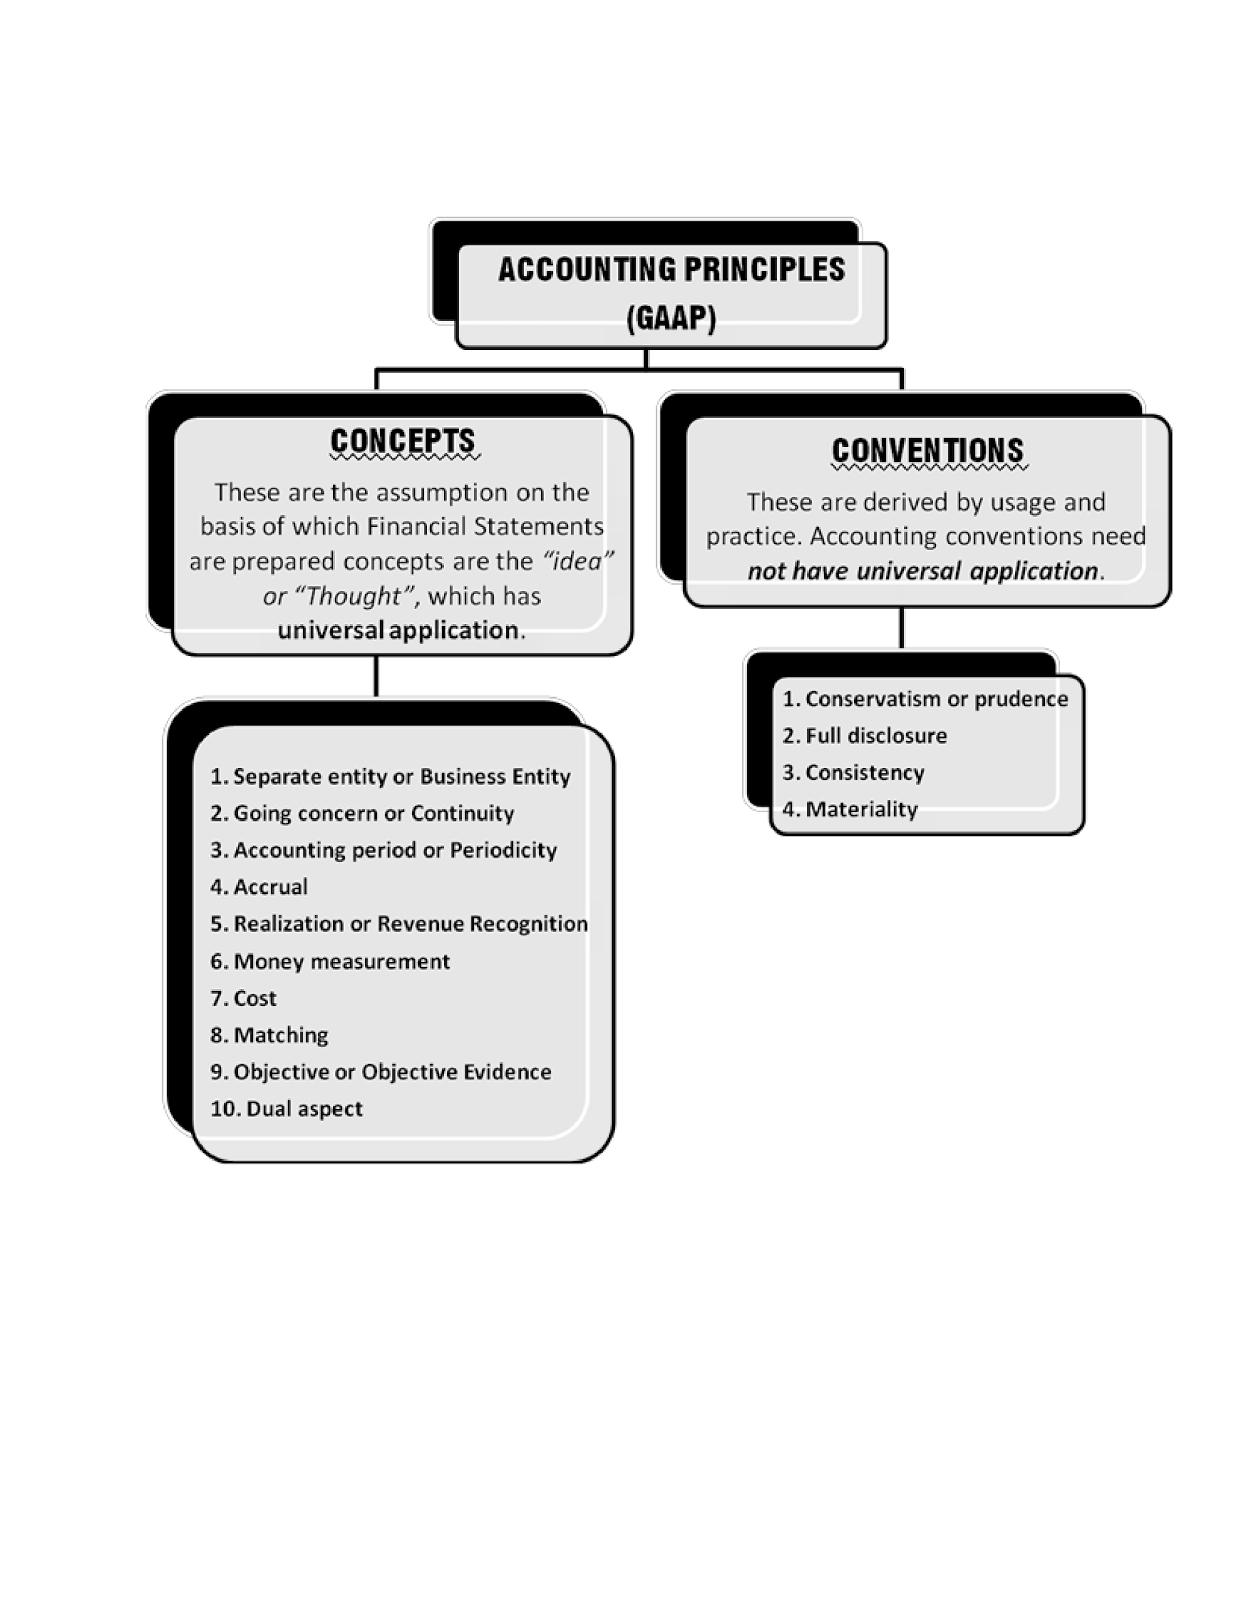 Basic Accounting Principles And Rules